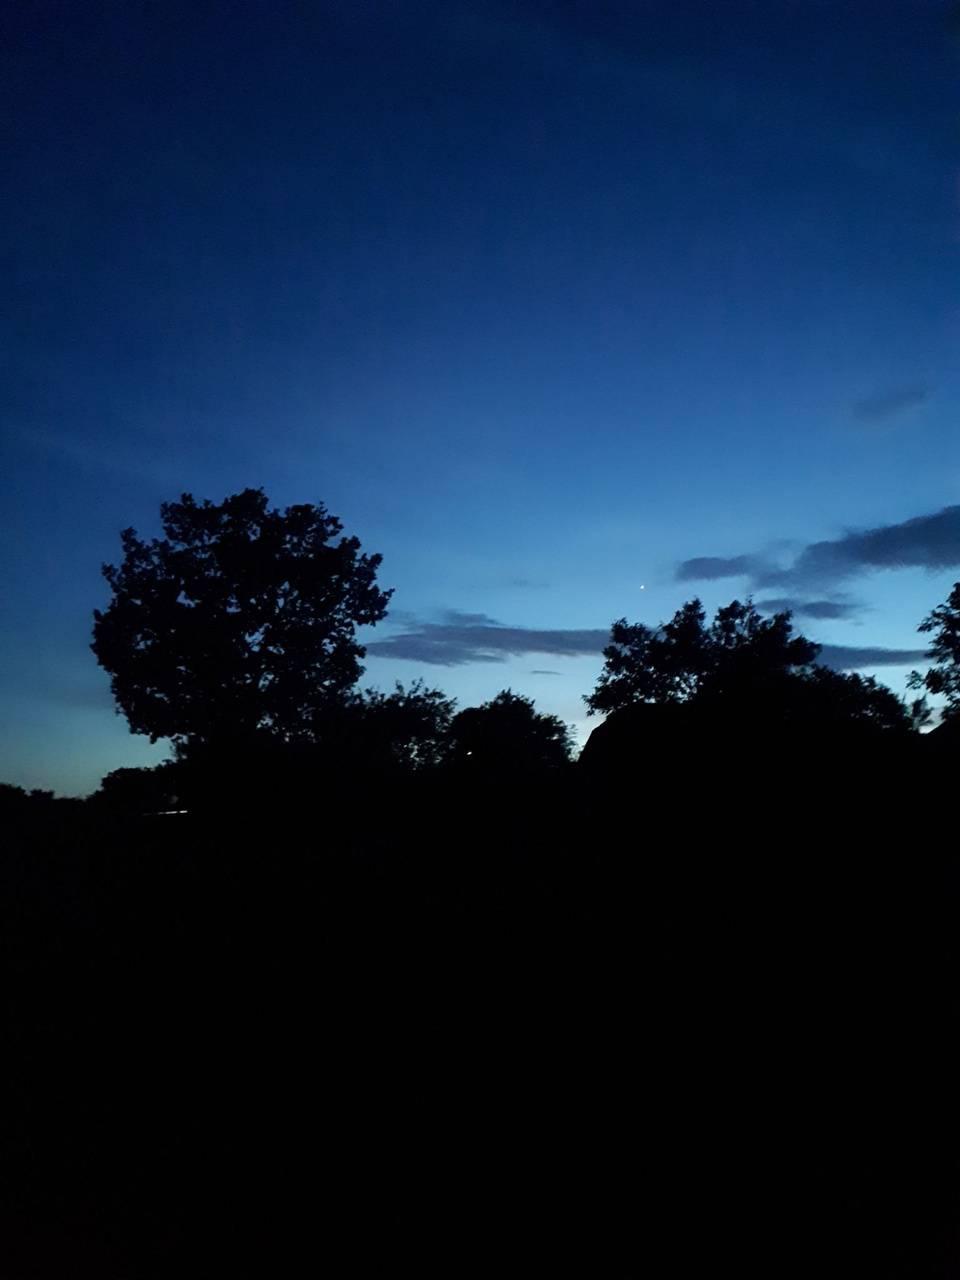 Night Sky and an Oak